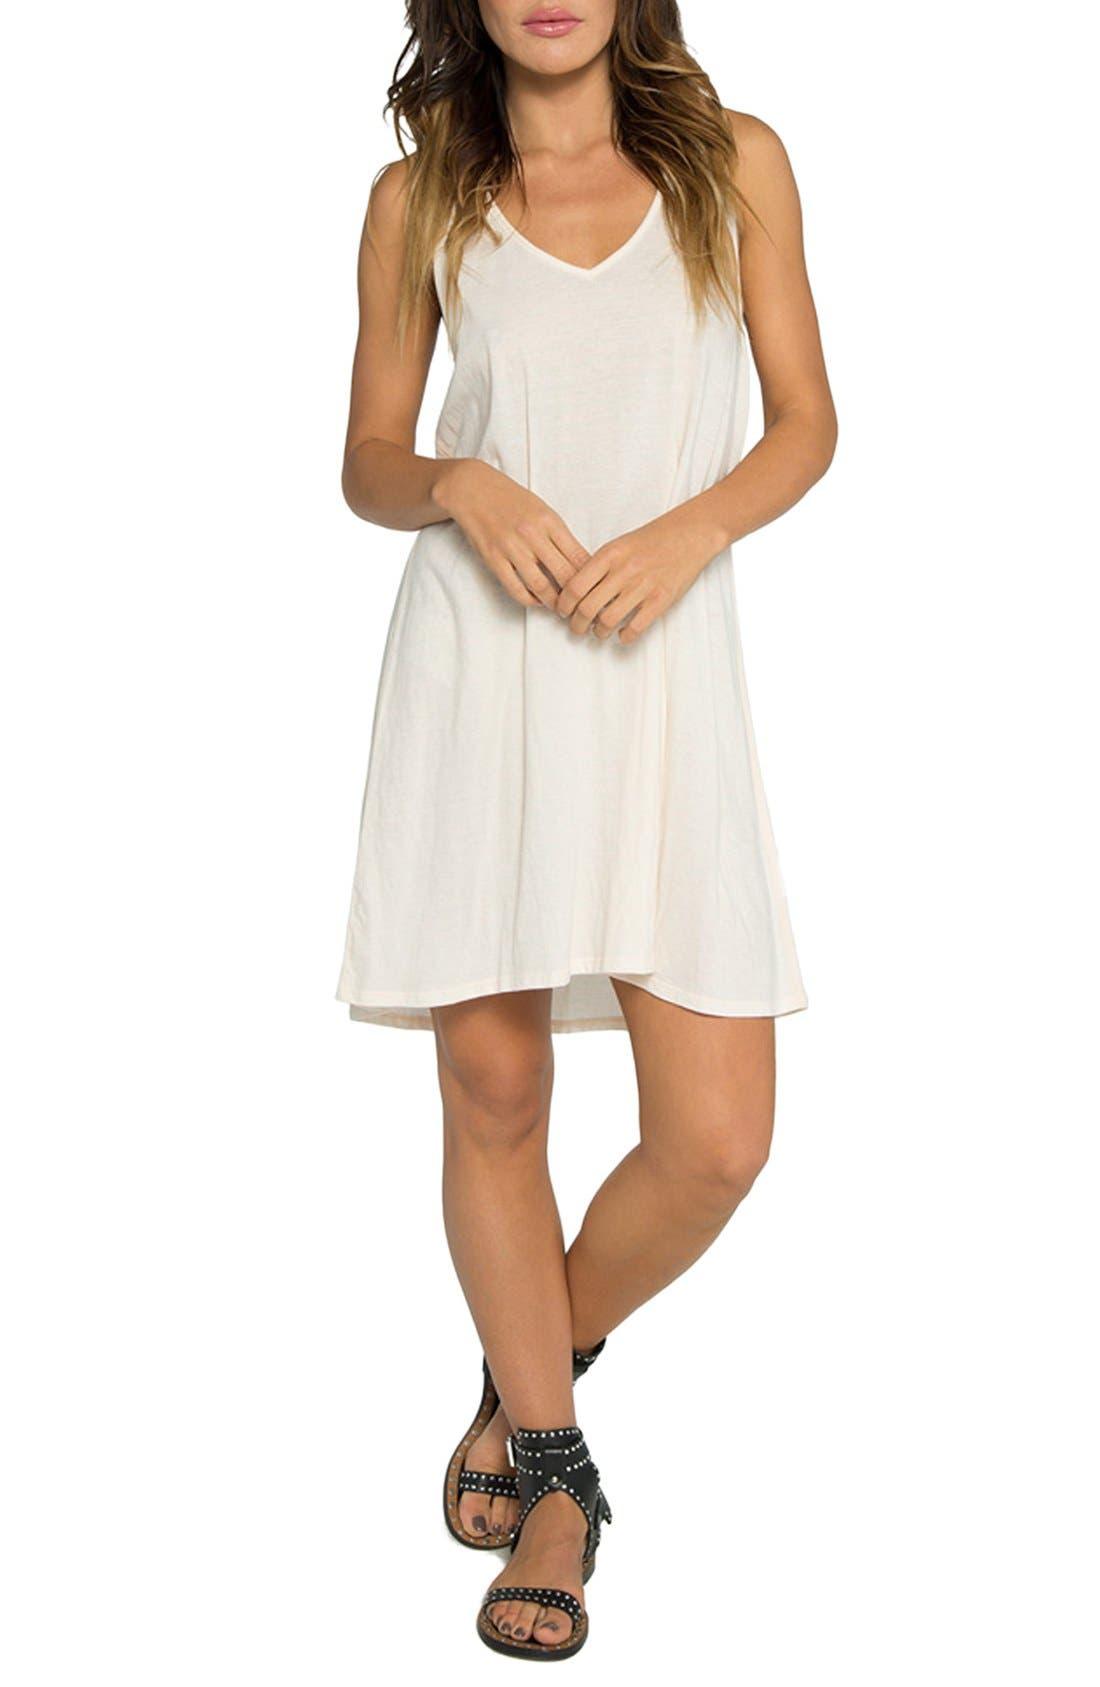 Main Image - TAVIK 'Mila' Knit Racerback Dress